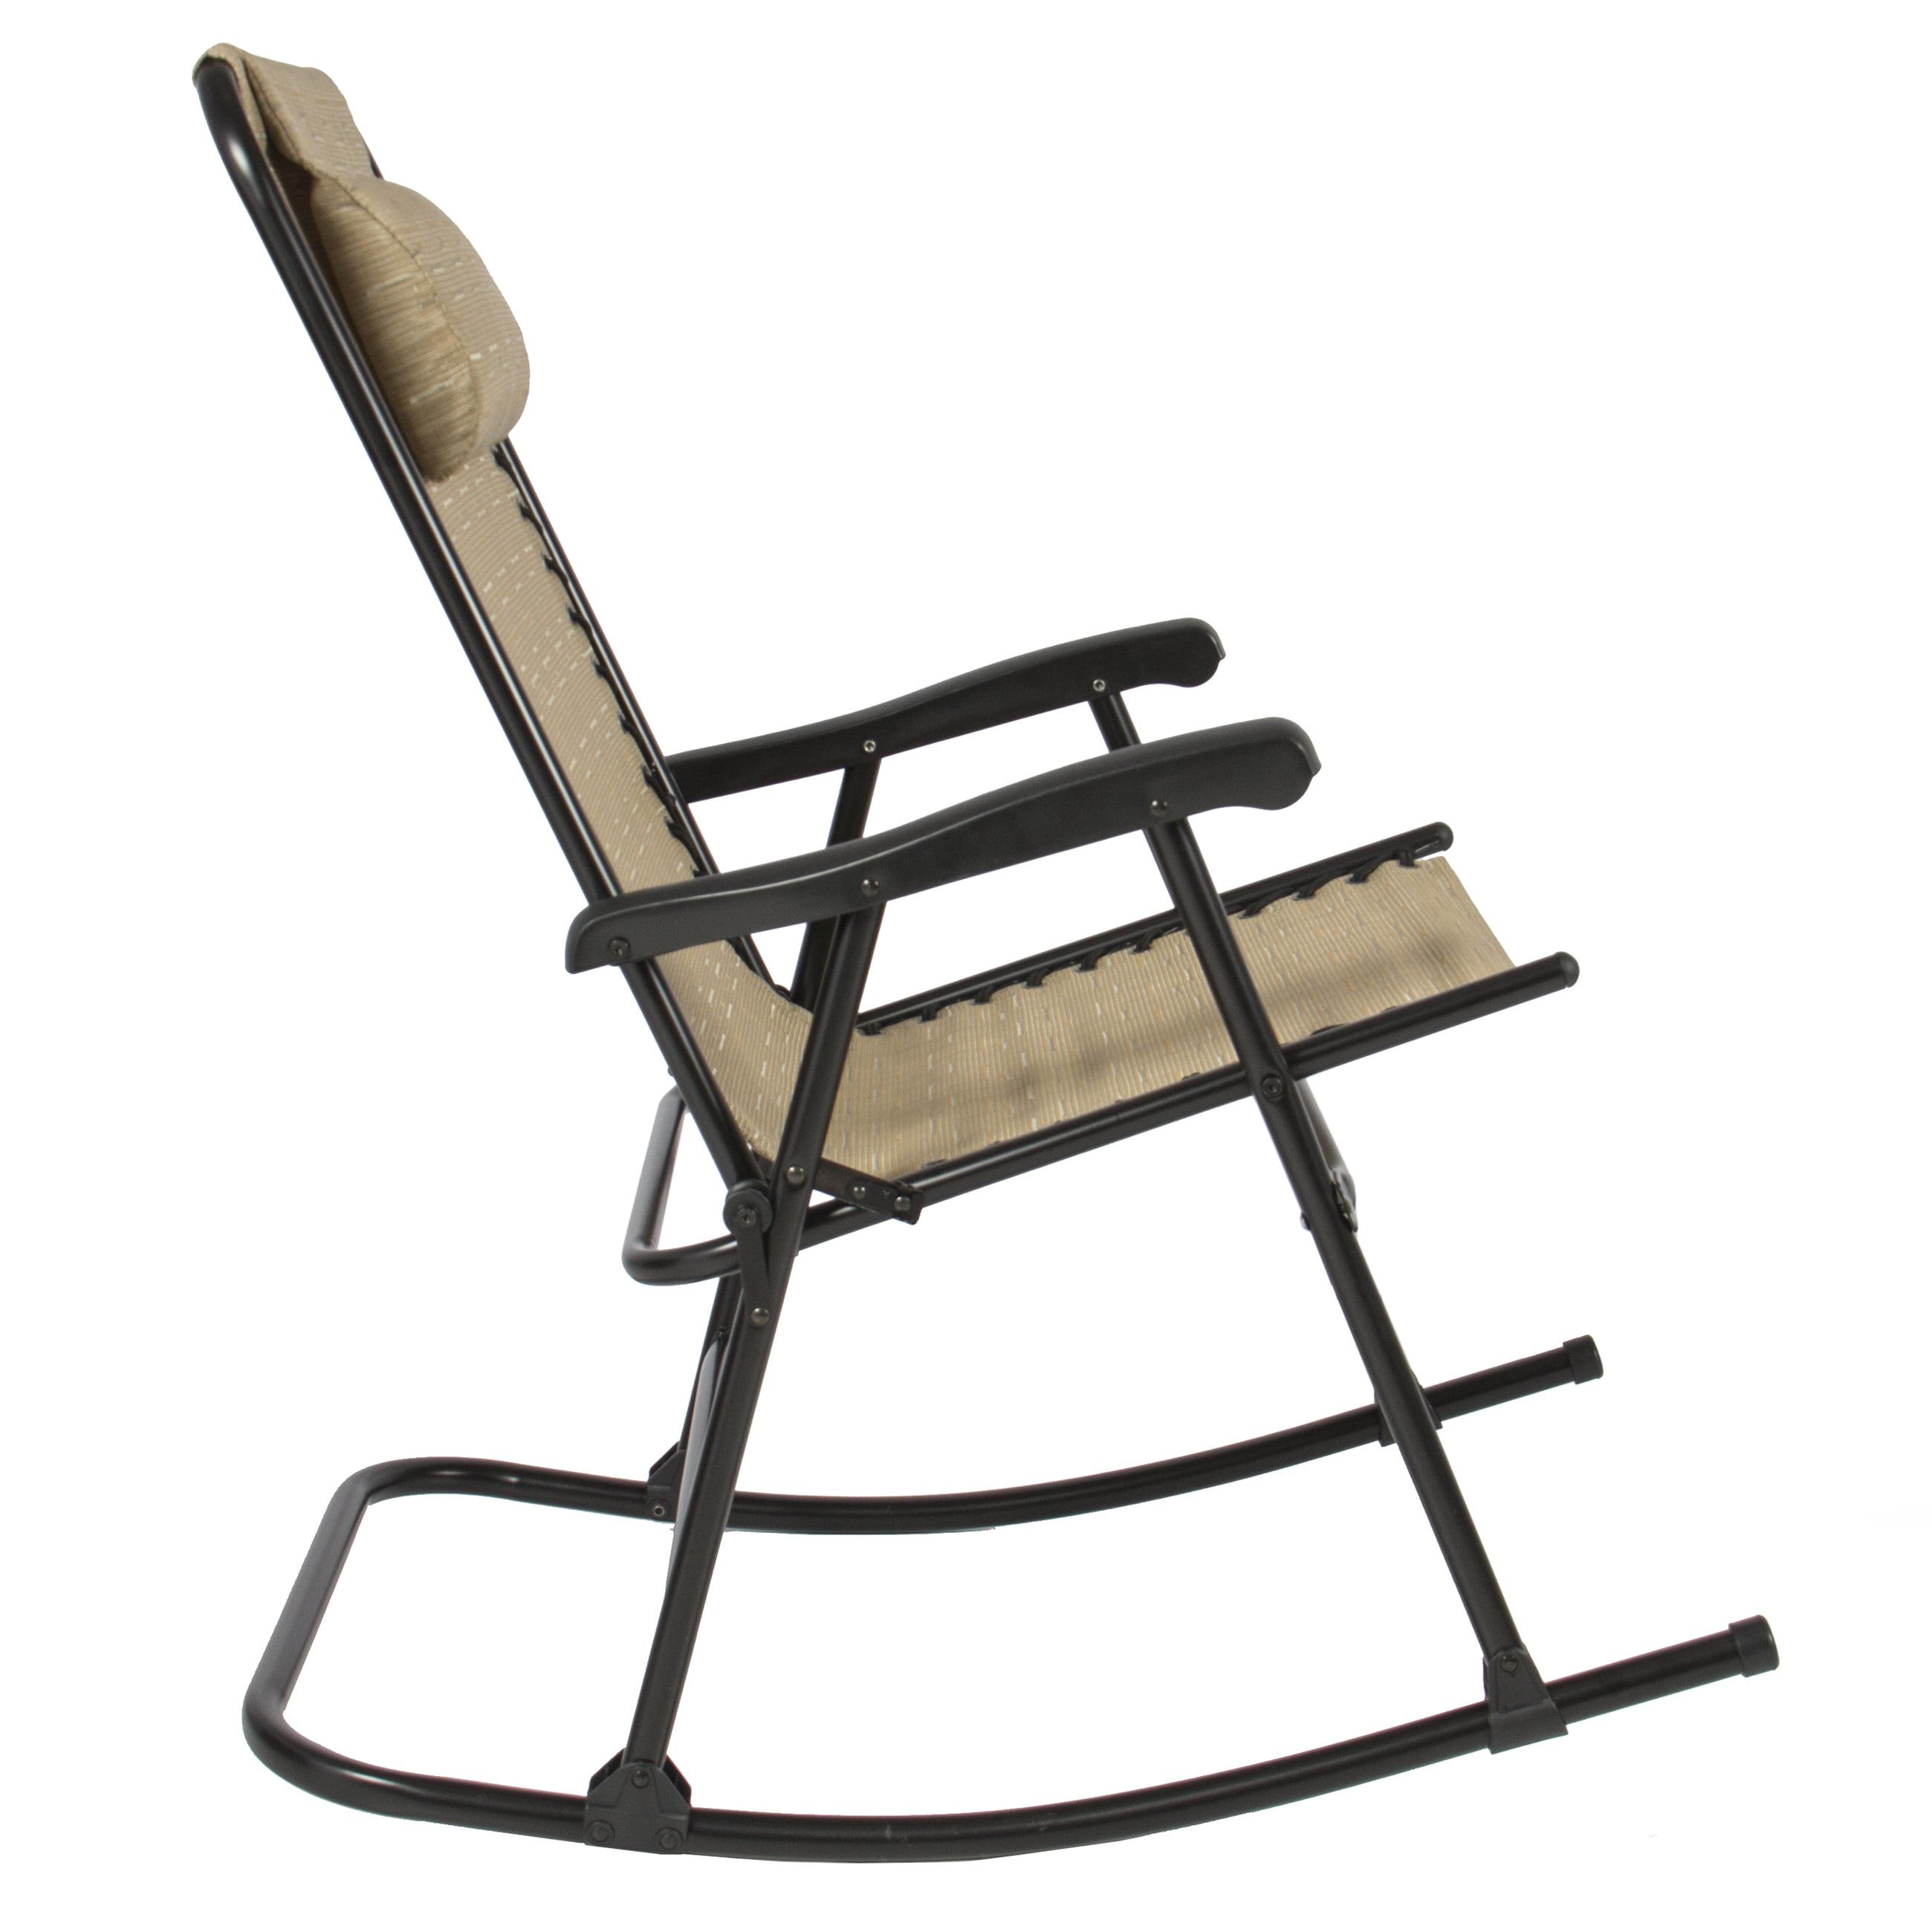 Outdoor rocking chairs - Outdoor Rocking Chairs 34